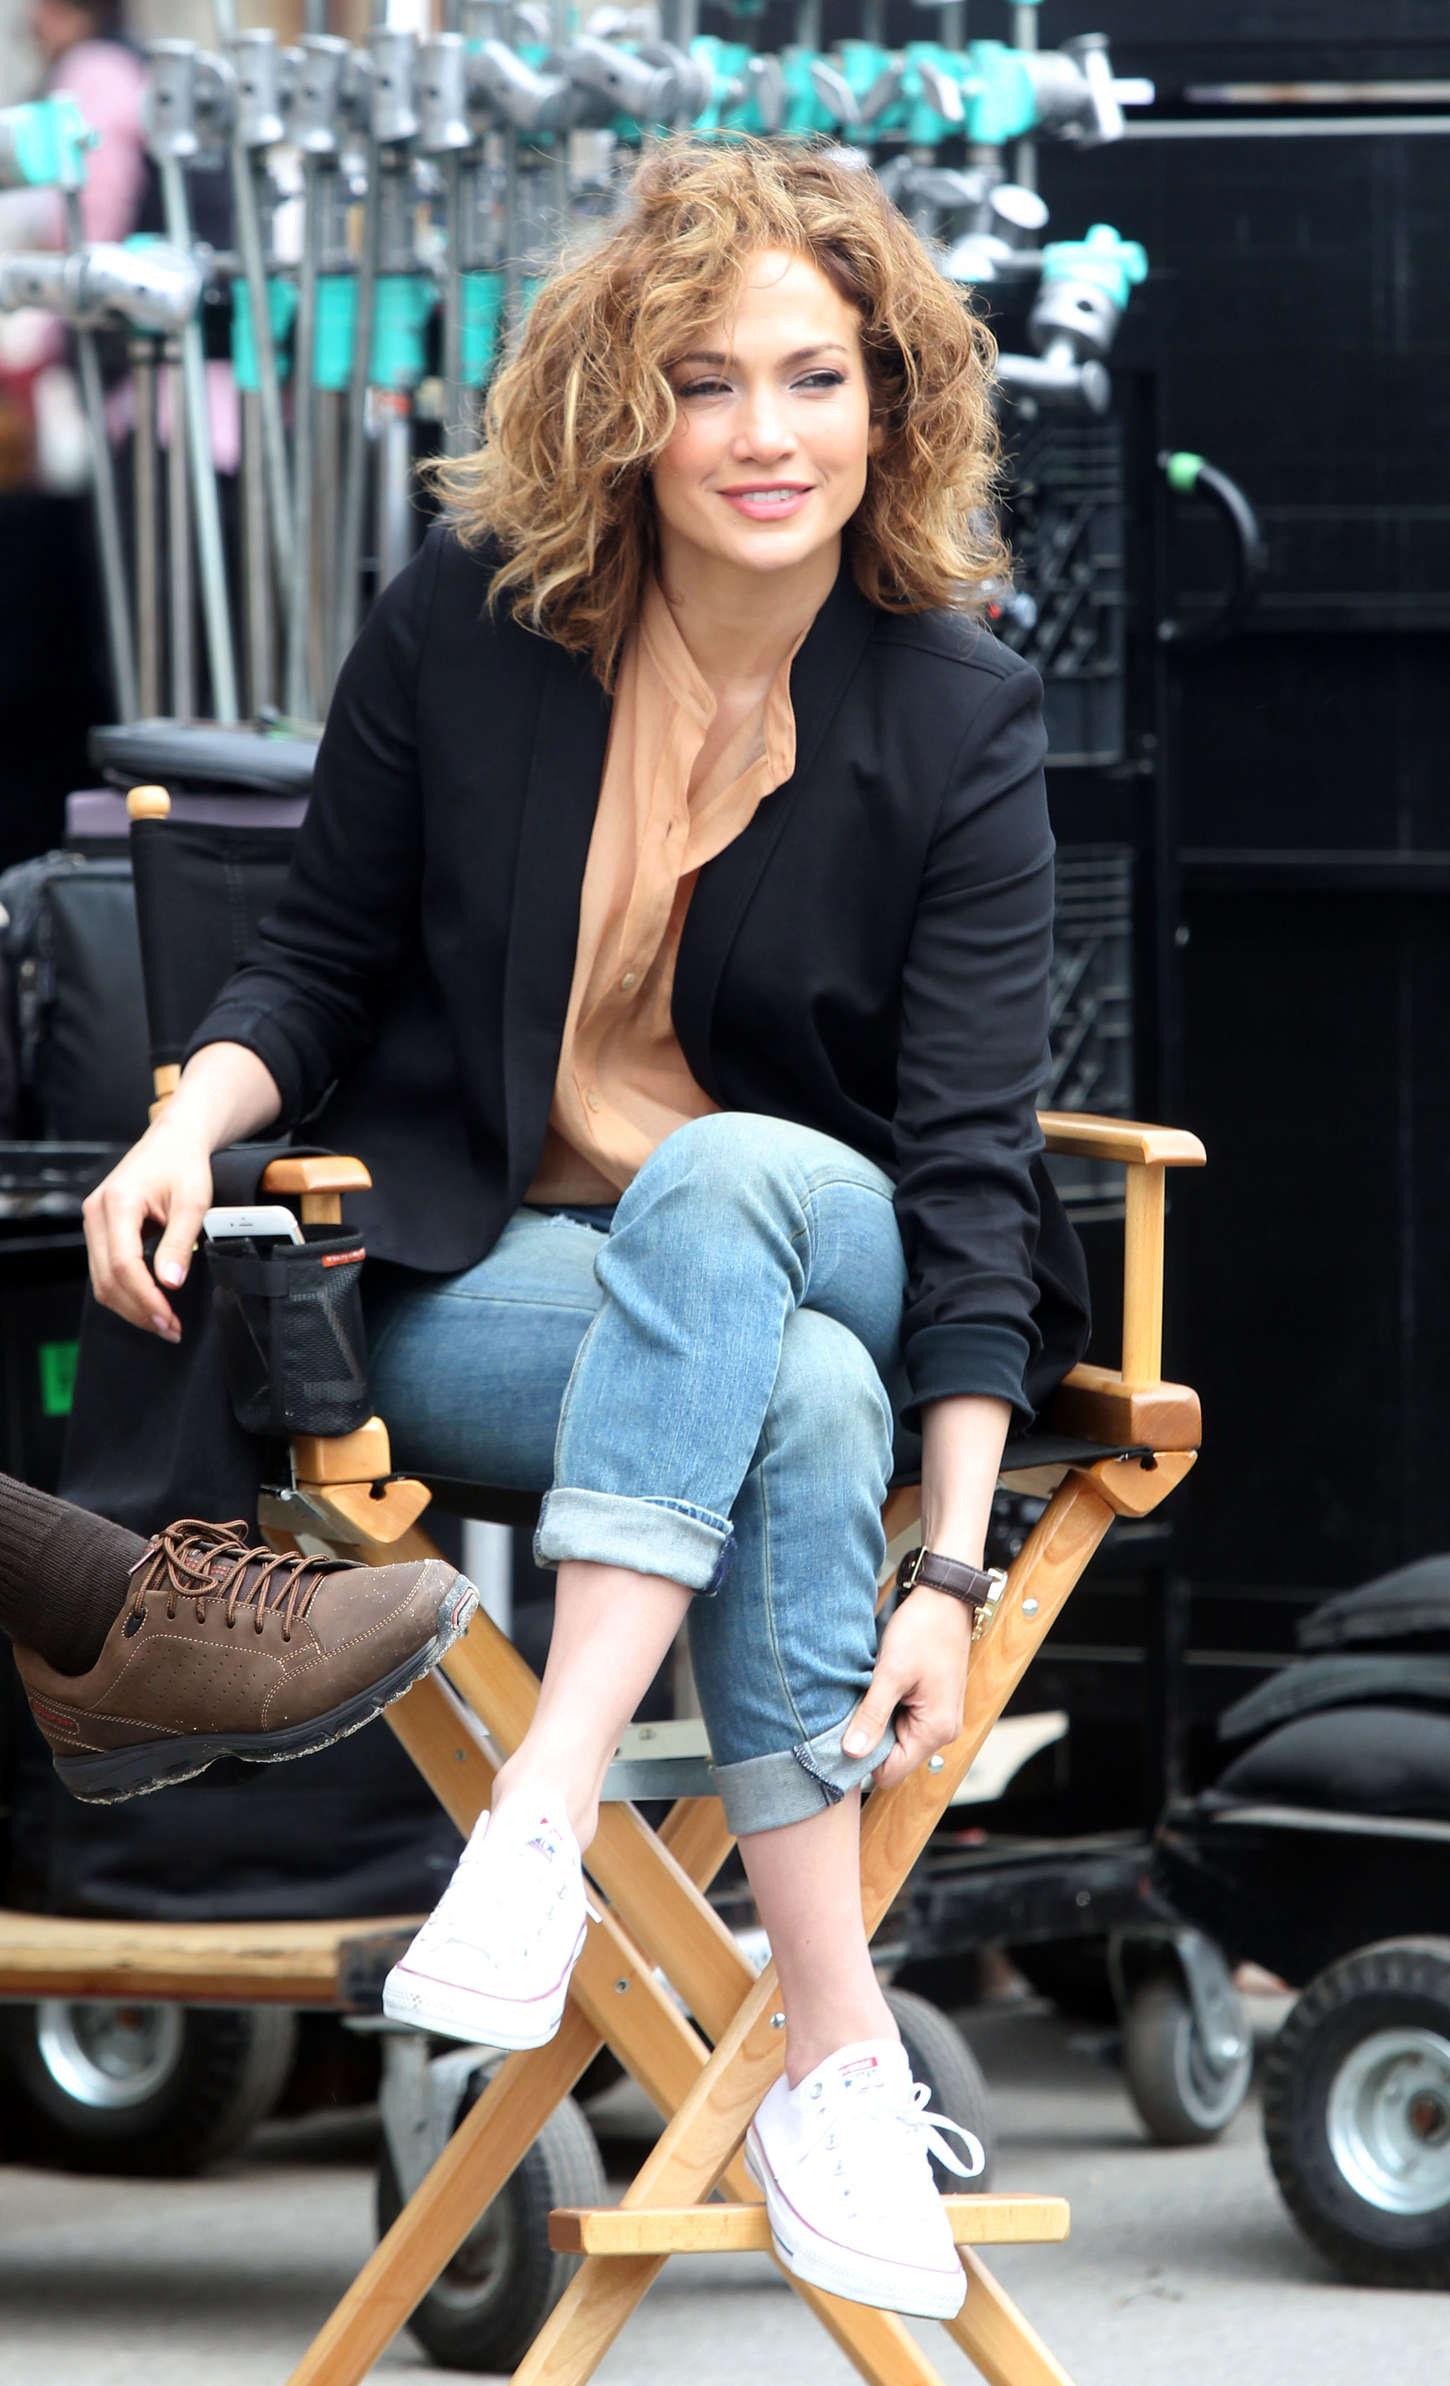 Jennifer Lopez - On set of 'Shades of Blue' in NY